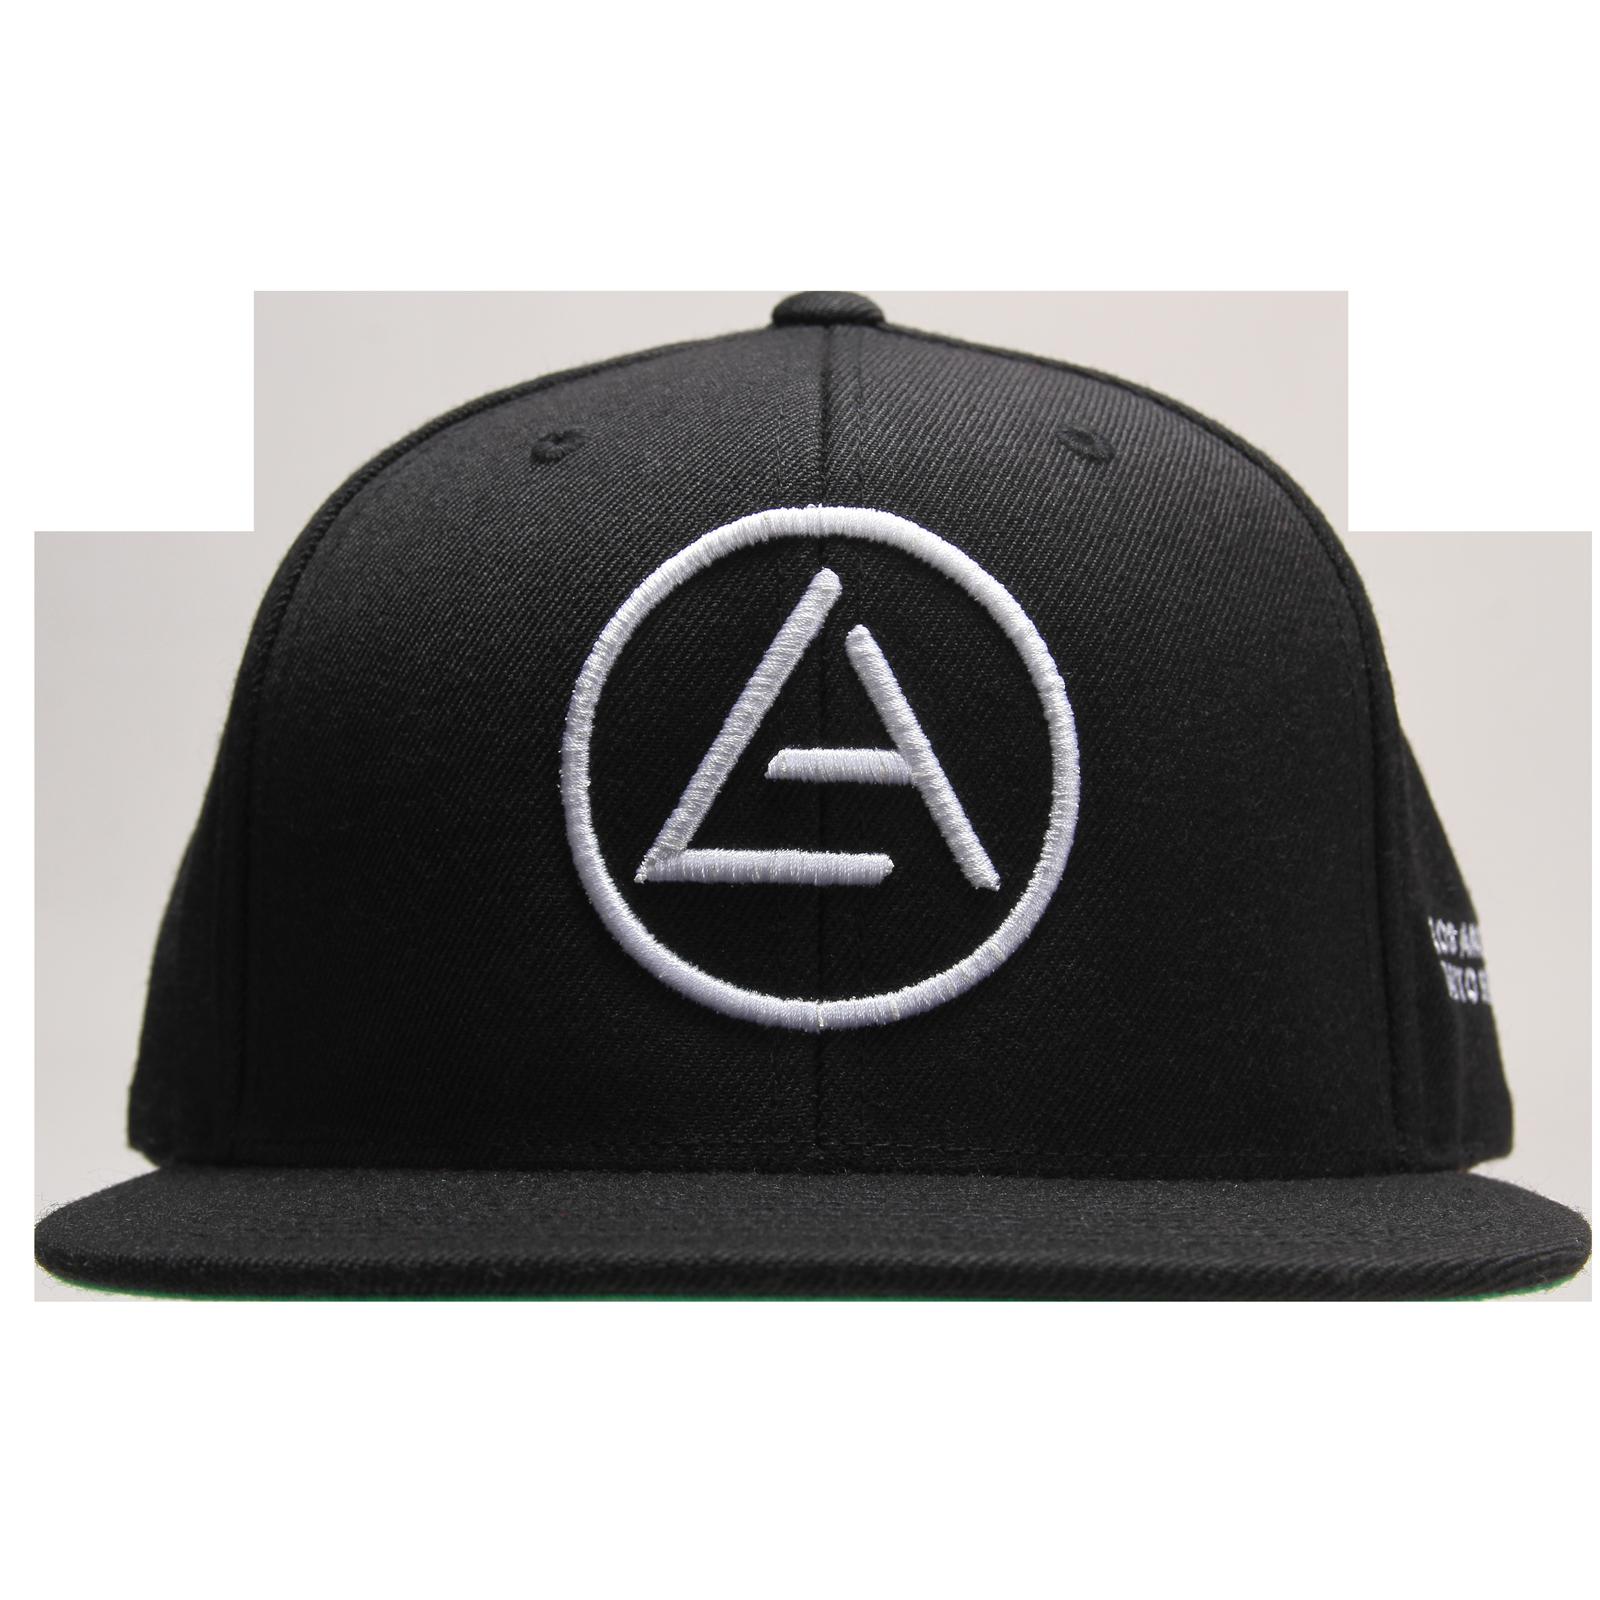 Flat Brim Snapback Hat